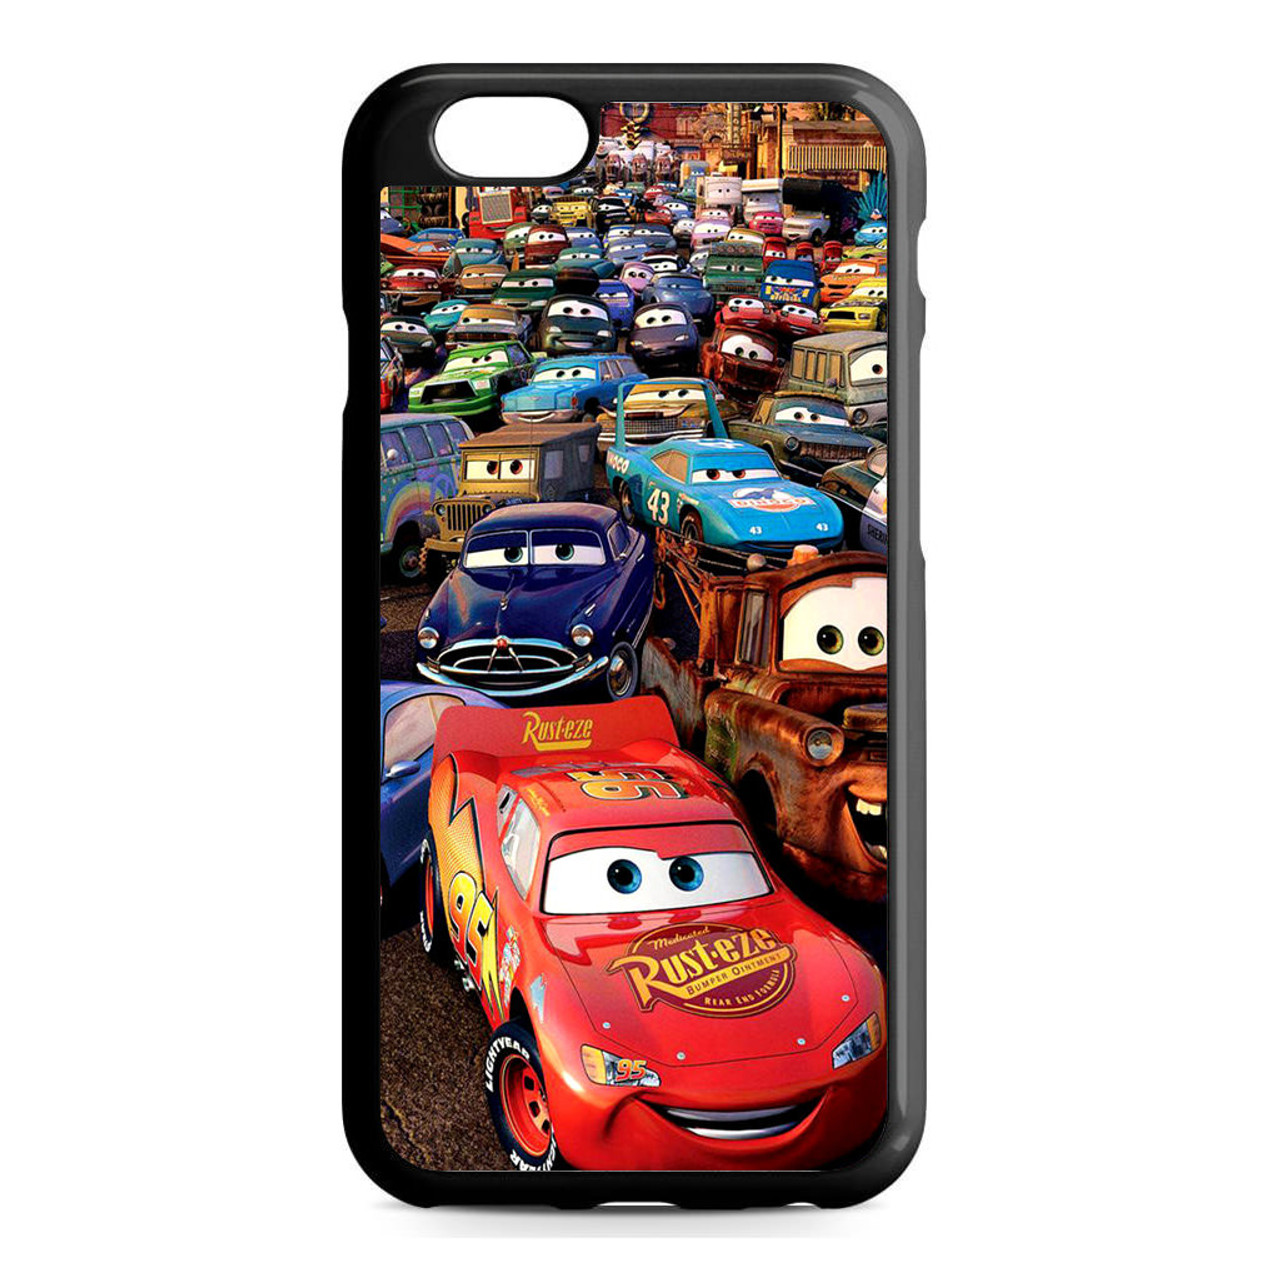 car iphone 6 case